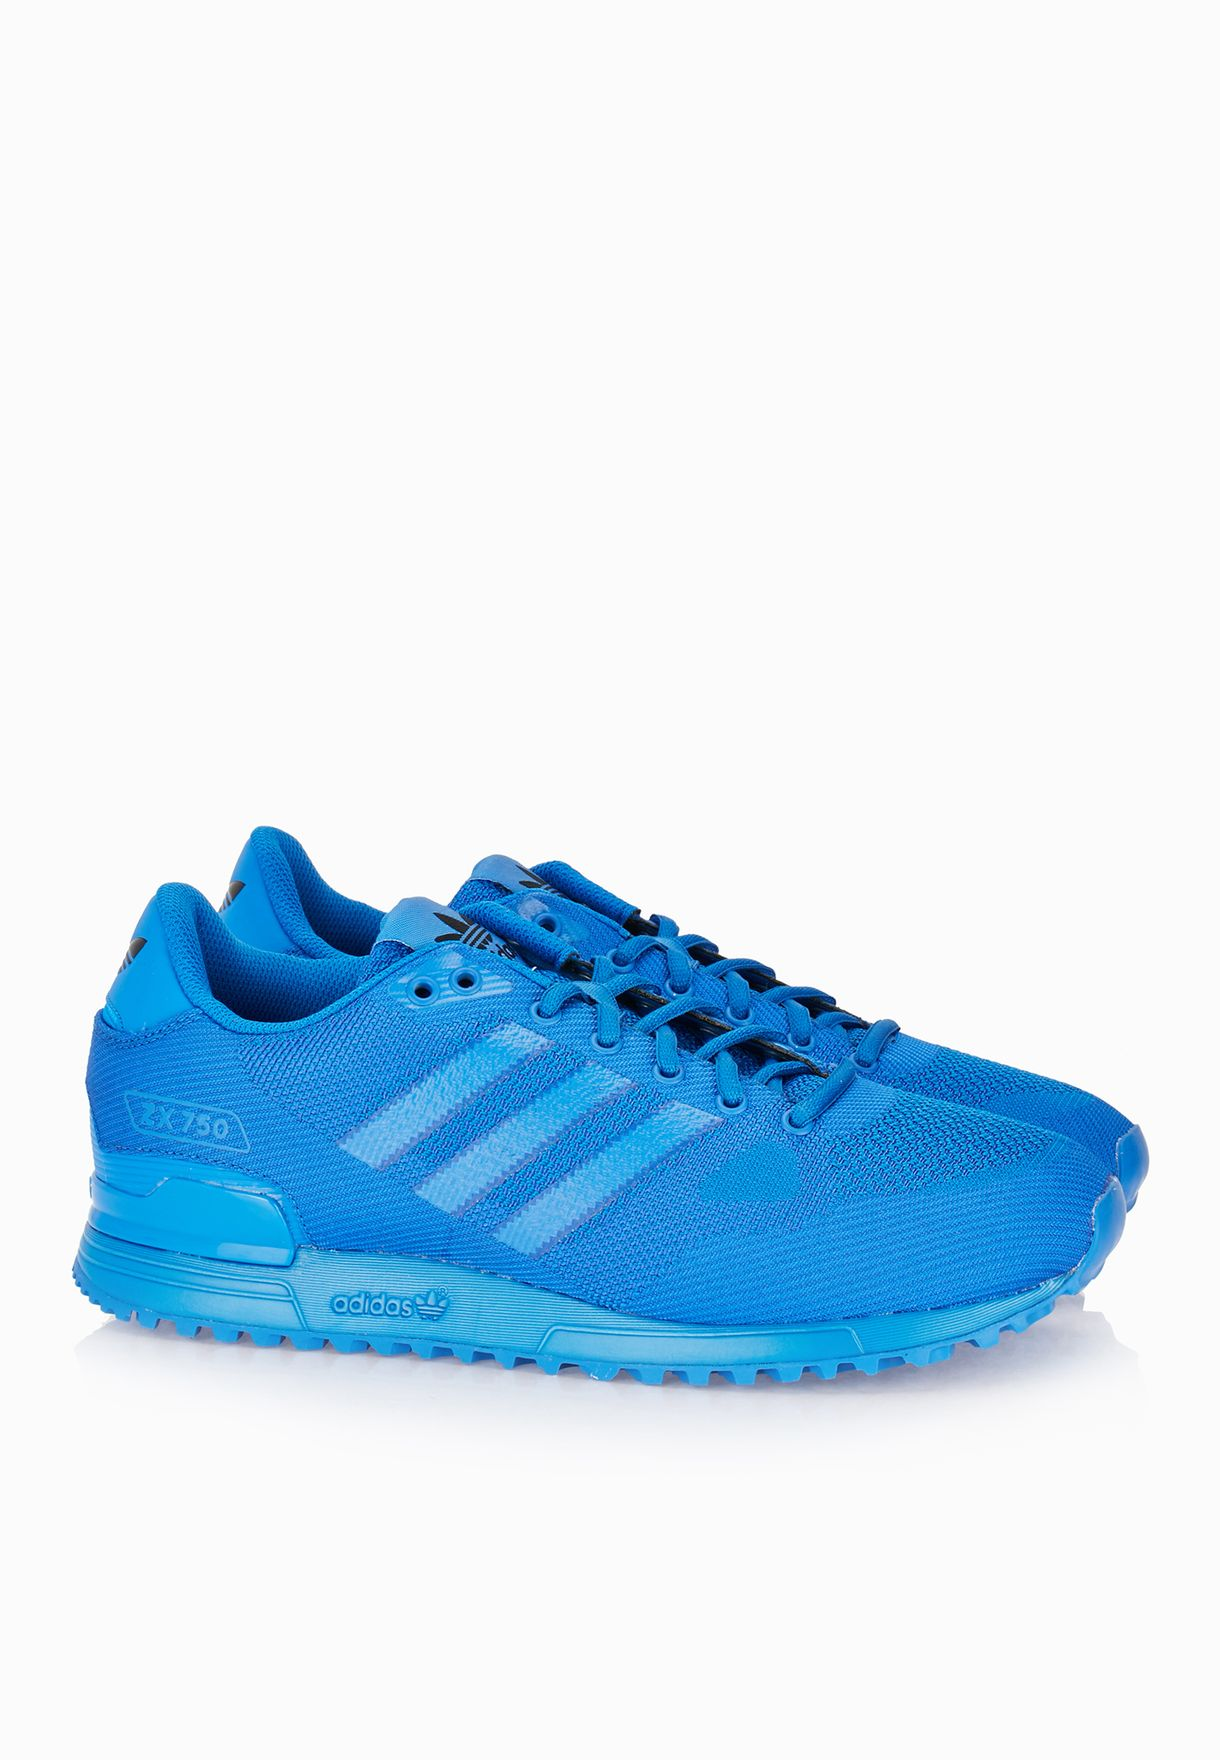 68d480f2cd06c Shop adidas Originals blue ZX 750 WV S80127 for Men in UAE ...